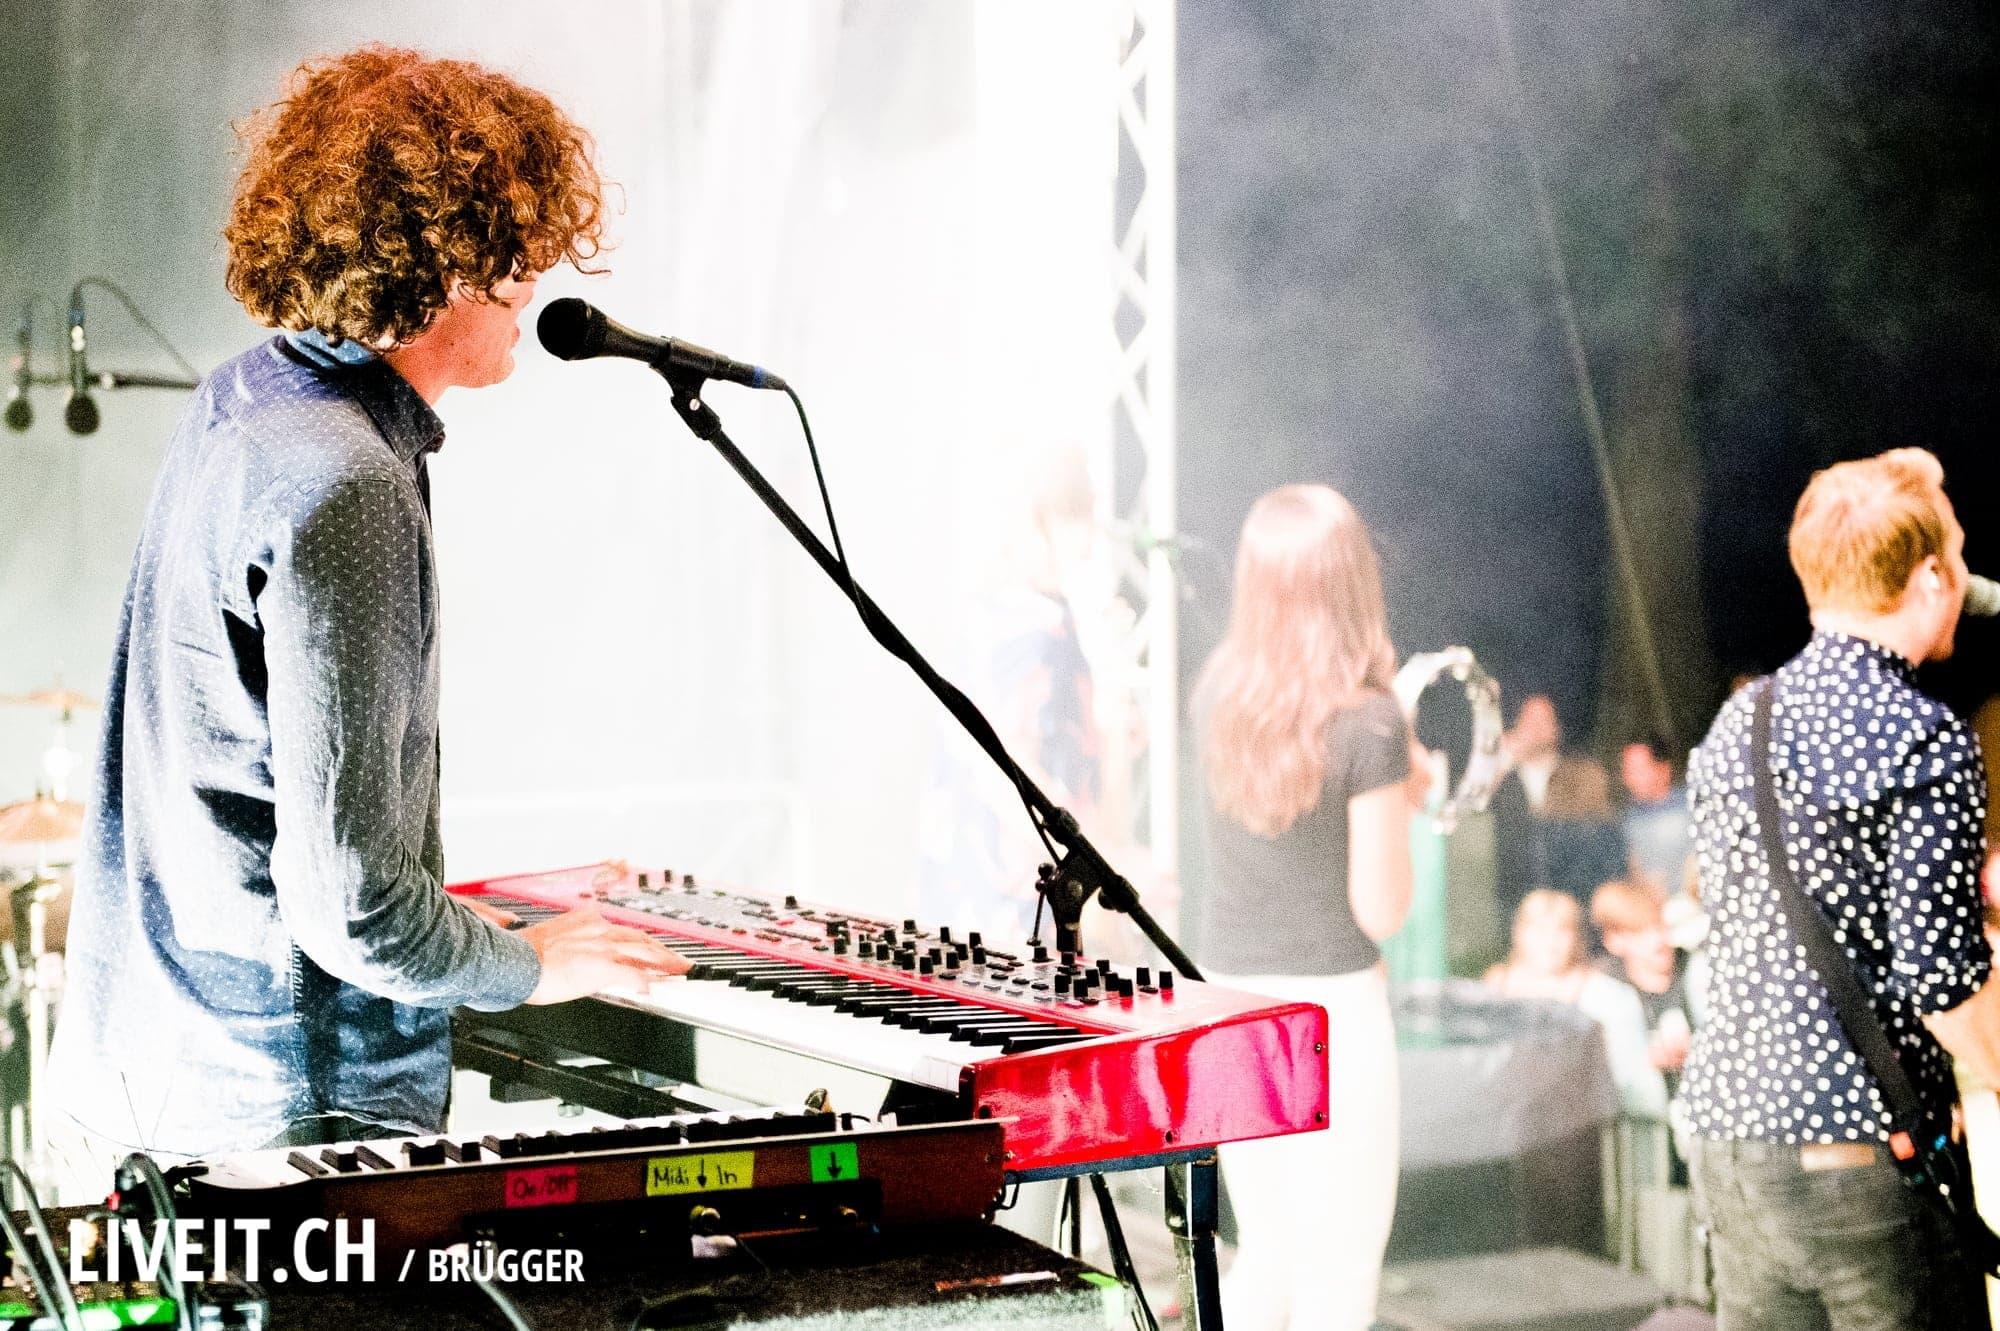 Bild: Dominic Bruegger / LIVEIT.CH